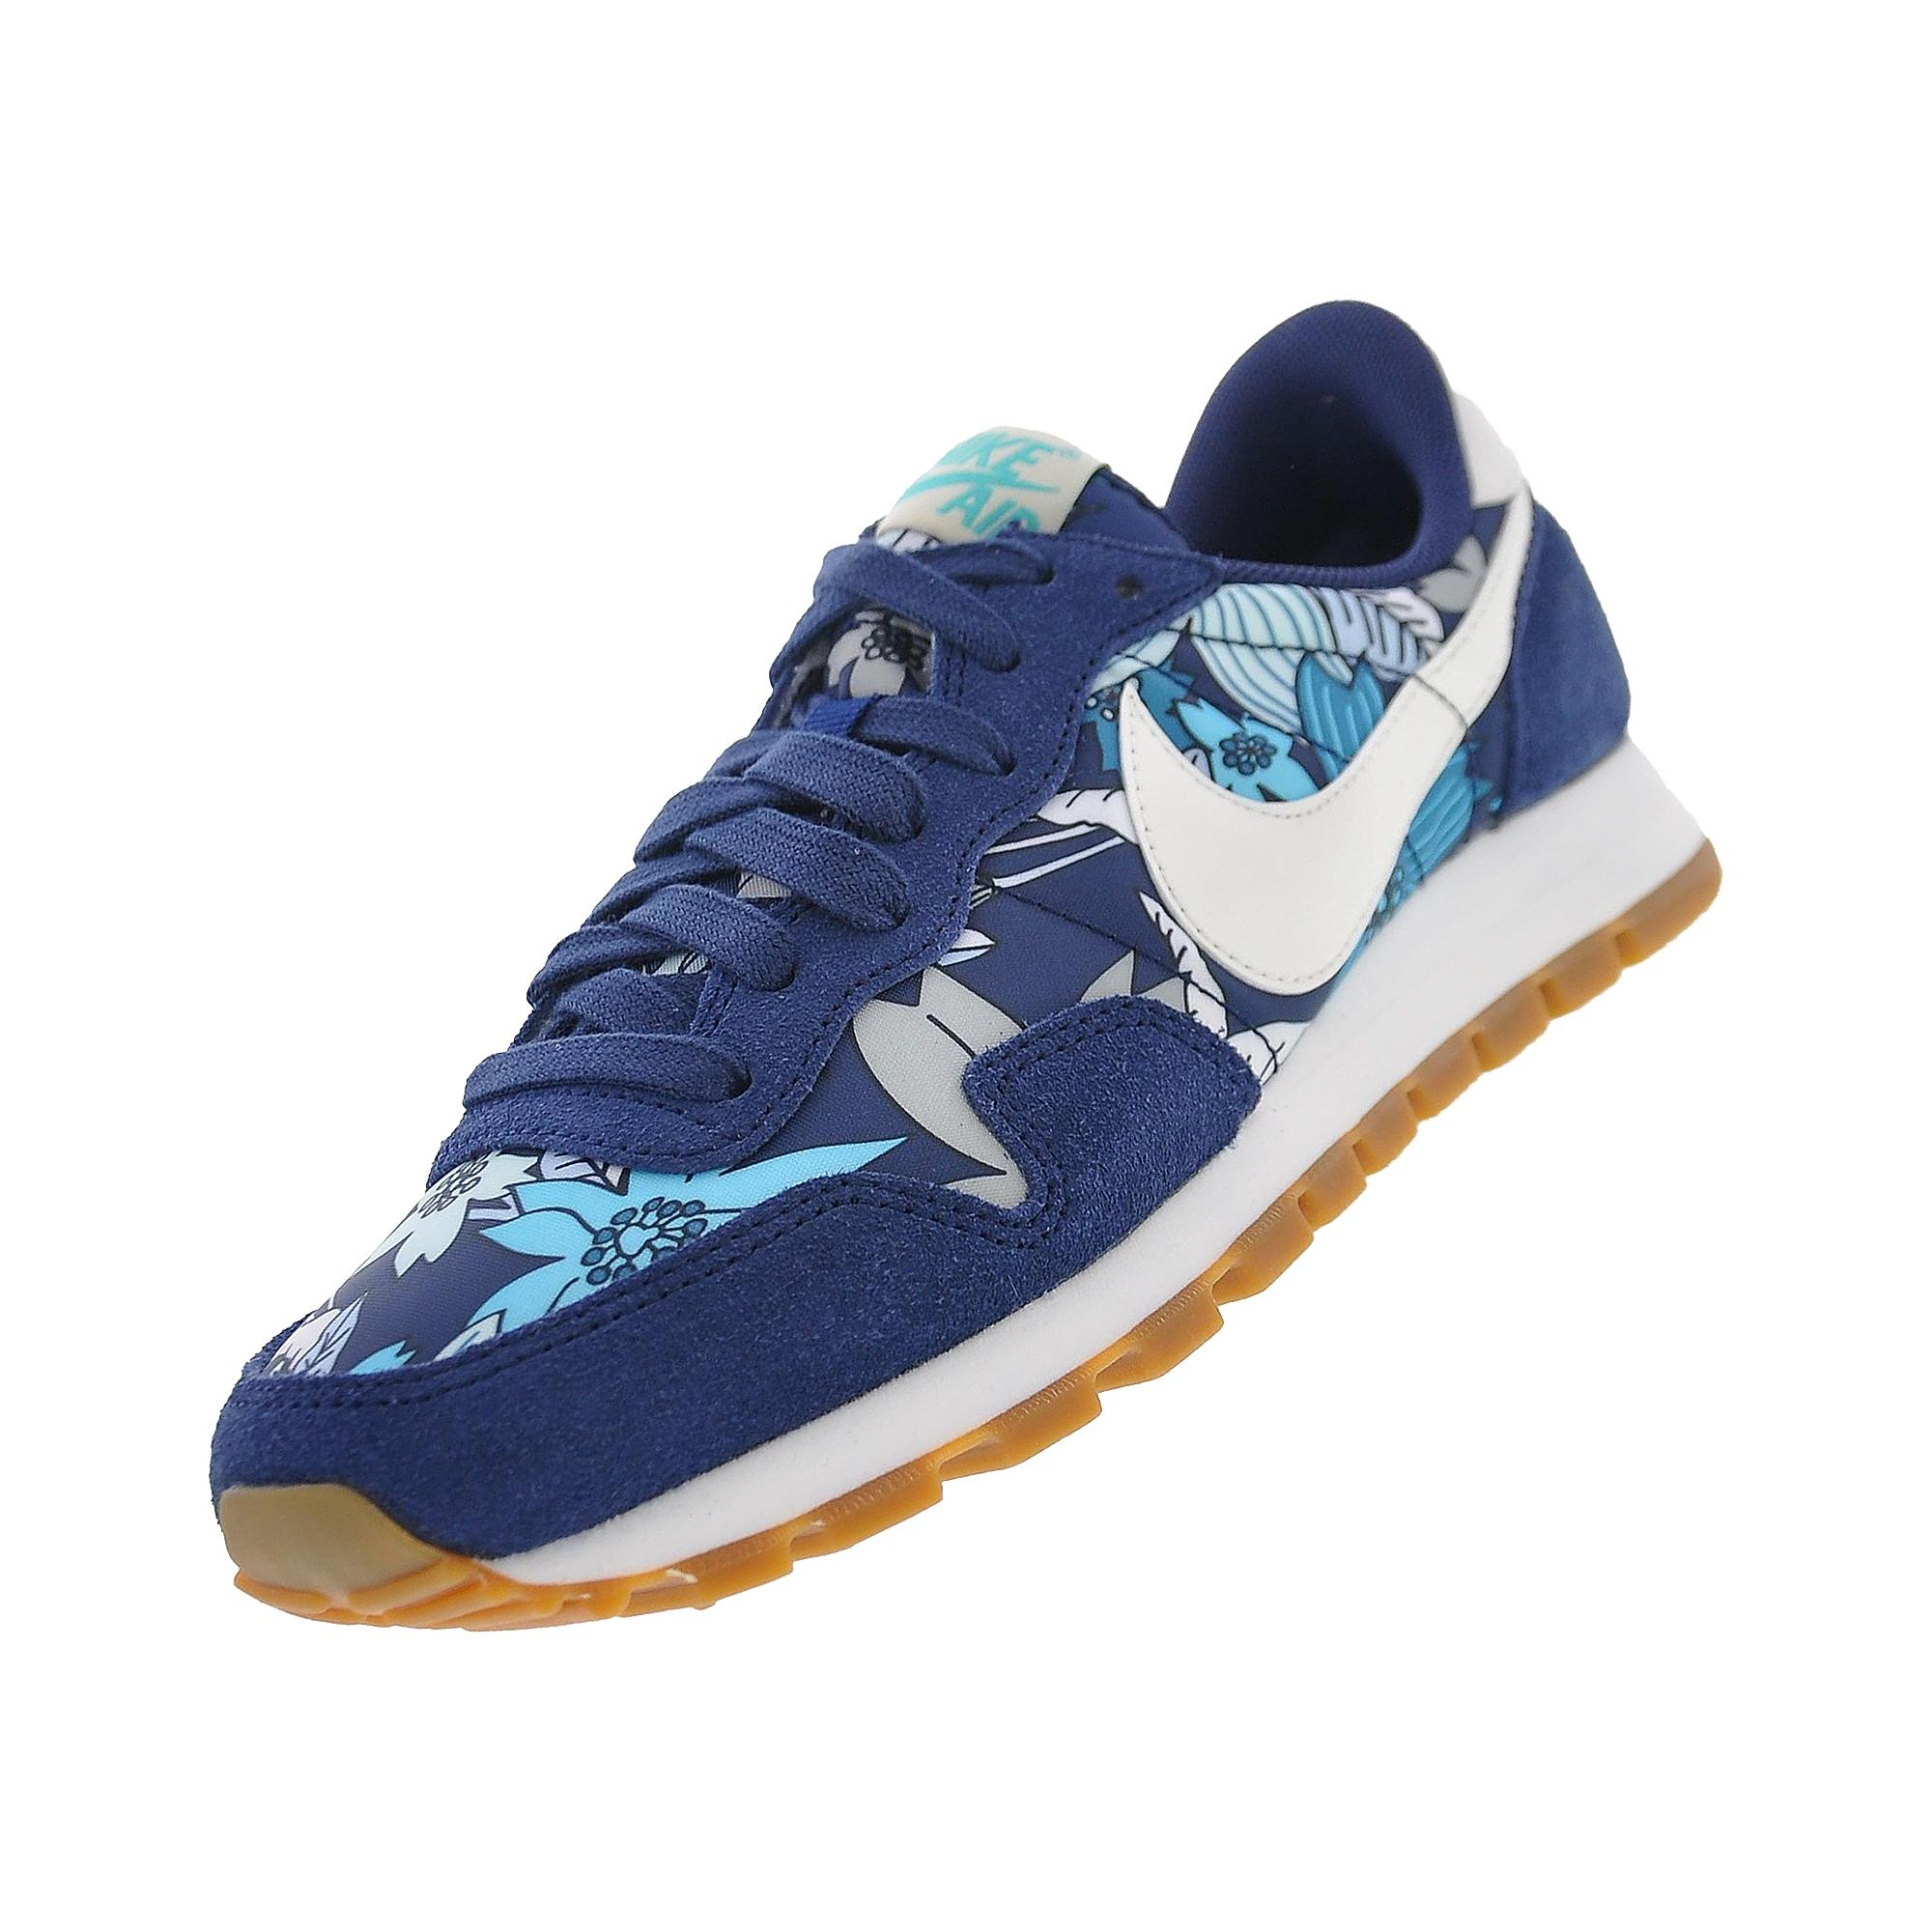 04108e0cf33cd Top Sport Nike Free 5.0 Plantar Fasciitis Shoes Asics